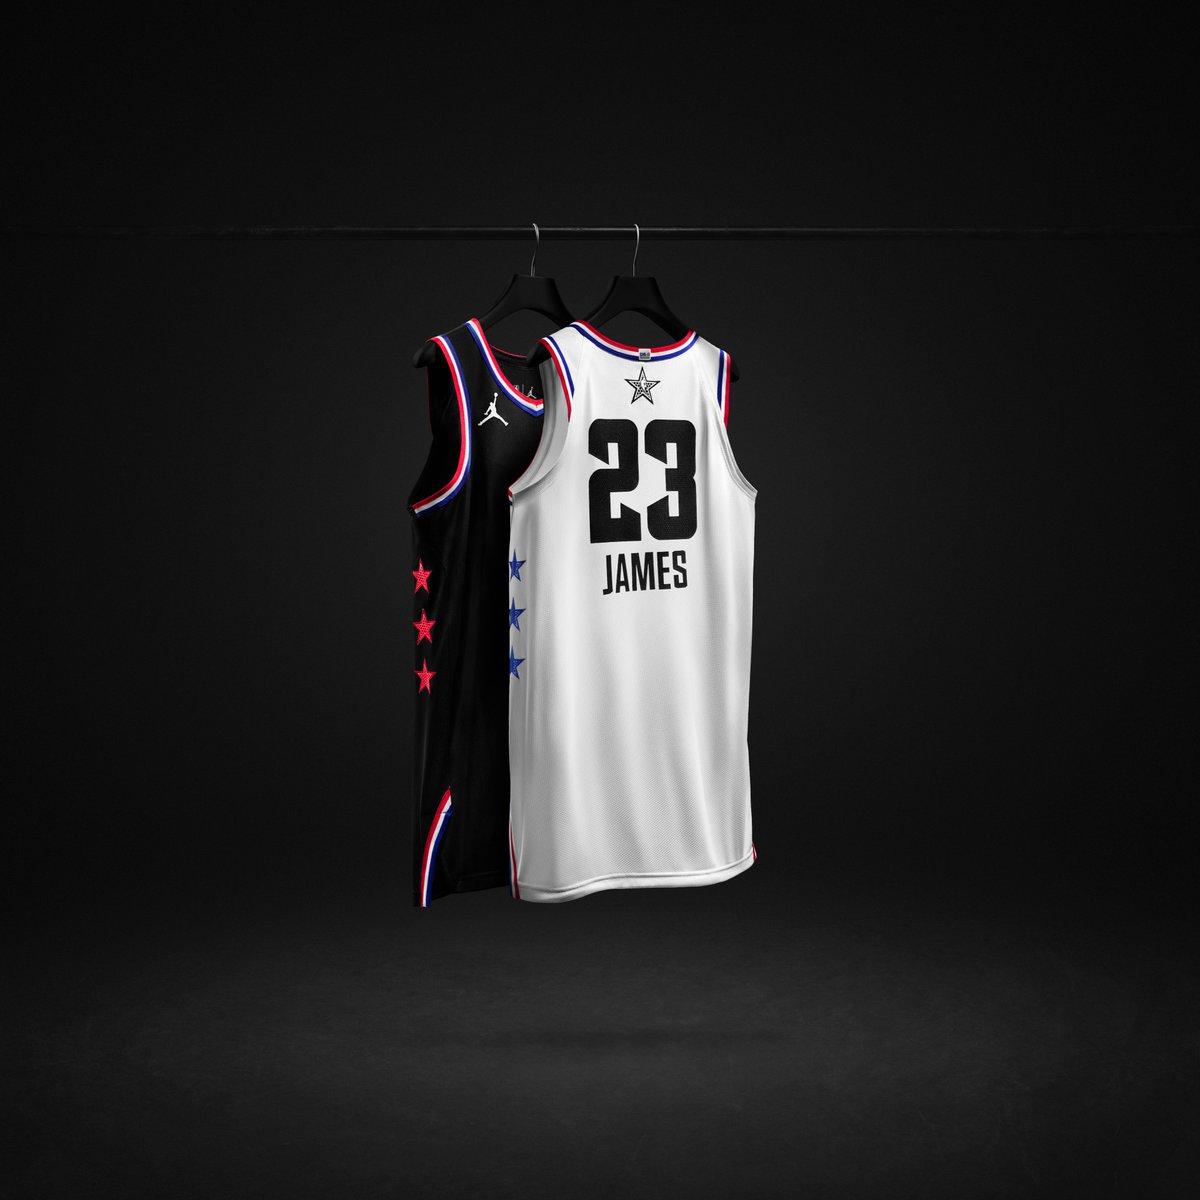 the 2019 Jordan Brand  NBAAllStar Edition Uniforms  https   swoo.sh 2Hwrg8e  pic.twitter.com fOM51Epb6F. 5 02 PM - 24 Jan 2019 6a41cda14